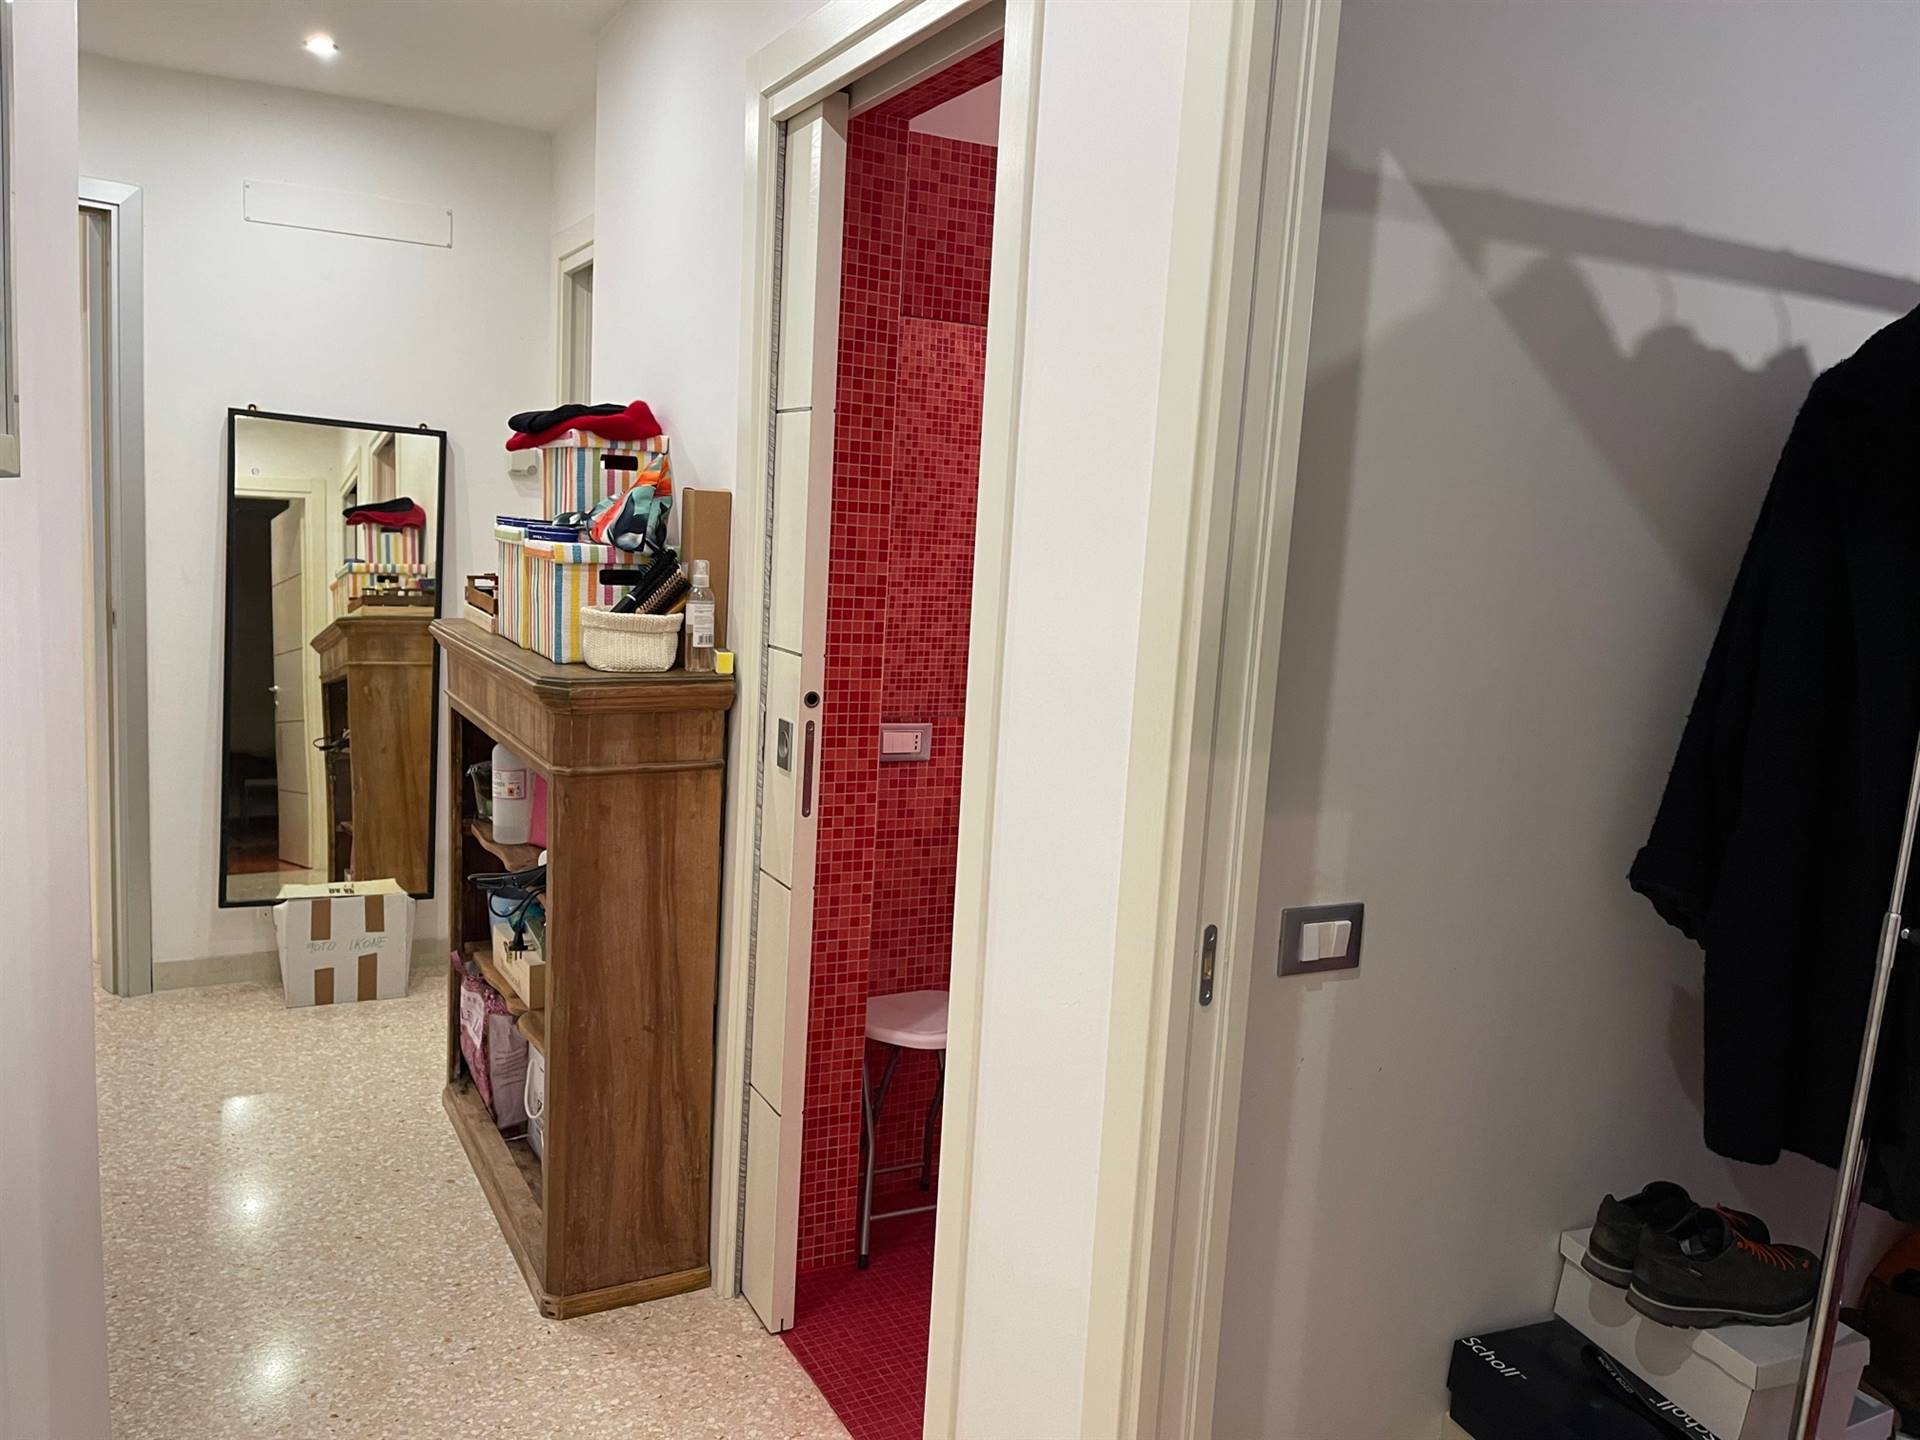 appartamento restaurato Venezia porta sola